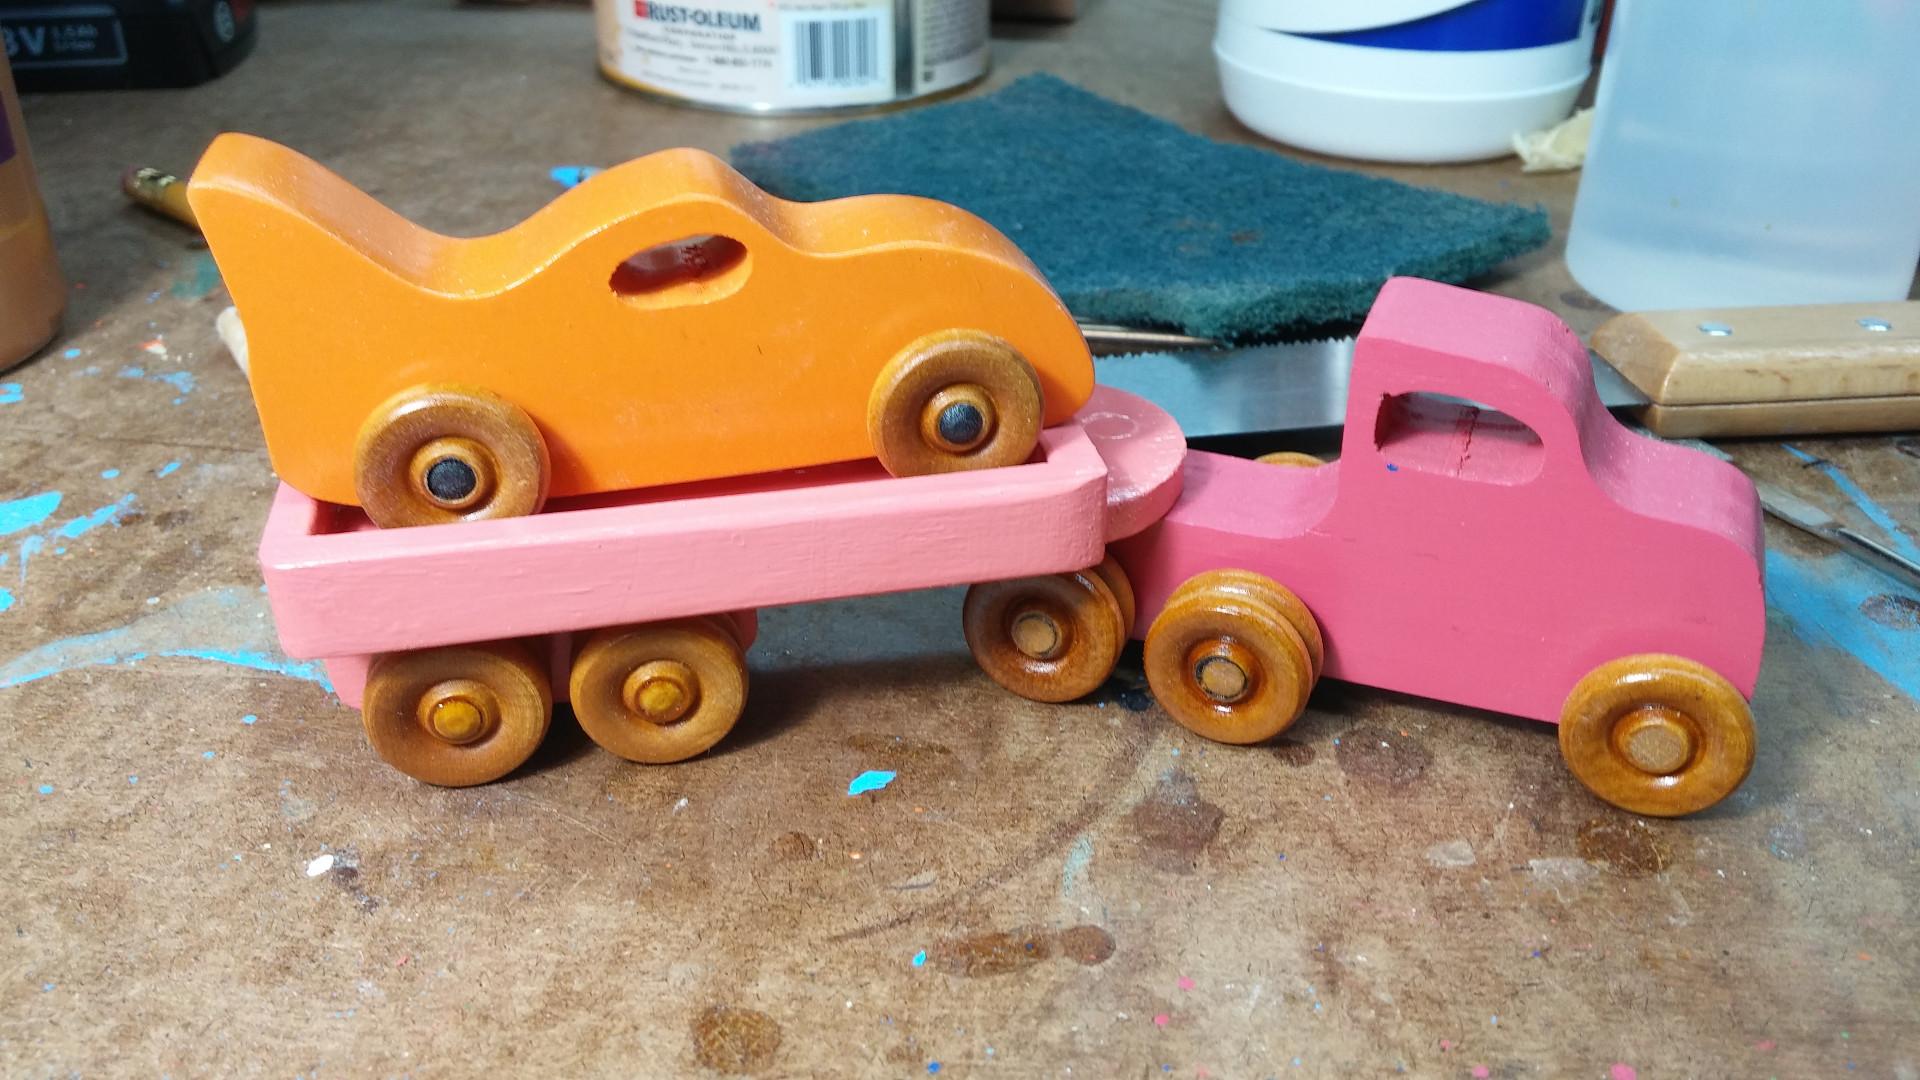 2017-05-11 04.22.14 - Wooden Toy - Trailer - Truck - Pink - Bat Car- Orange - Car Hauler.jpg